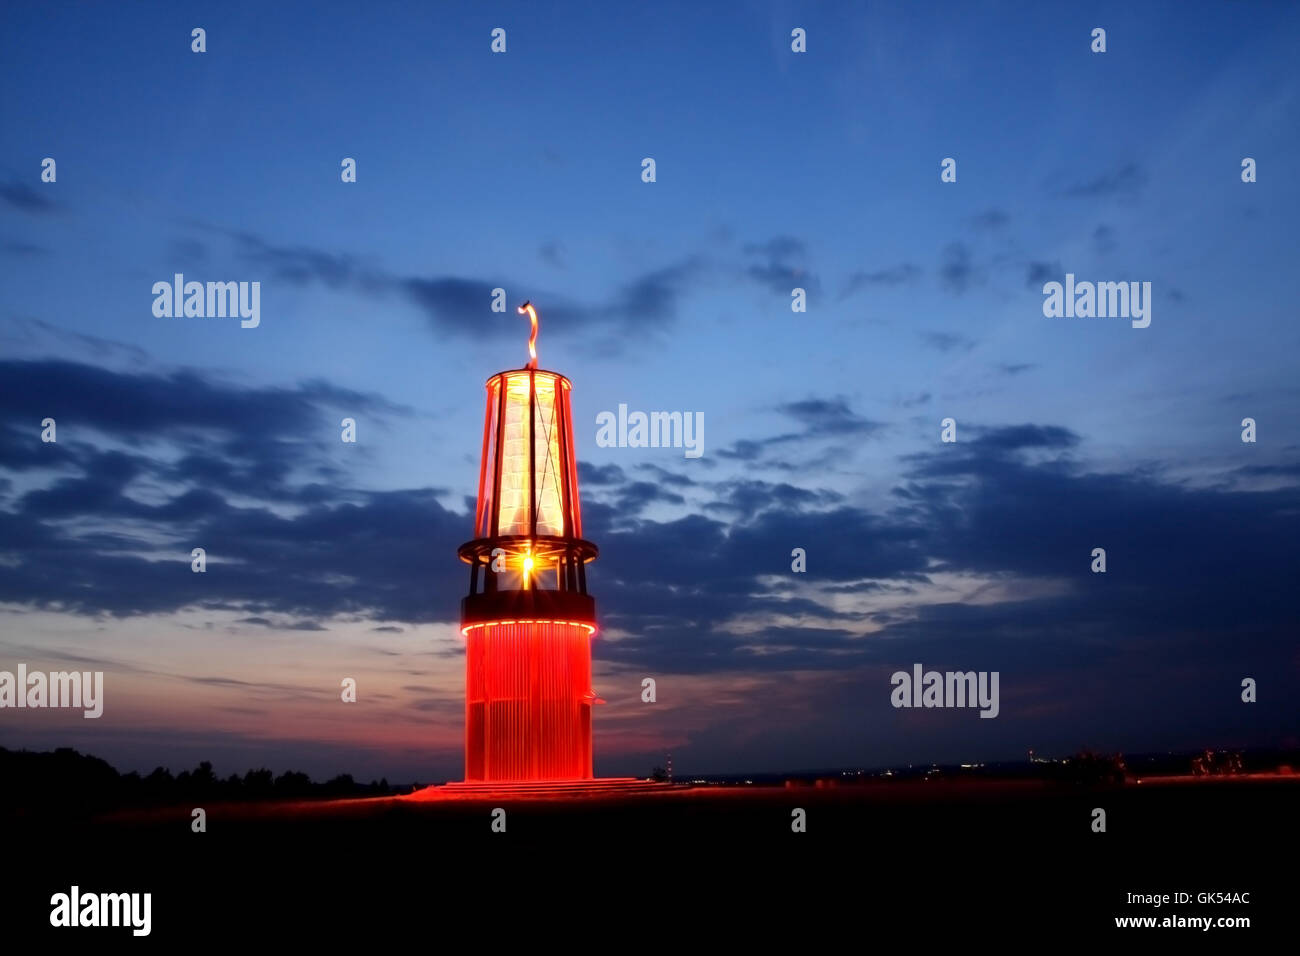 Emblem Sicherheitsleuchte Leuchtturm Stockbild